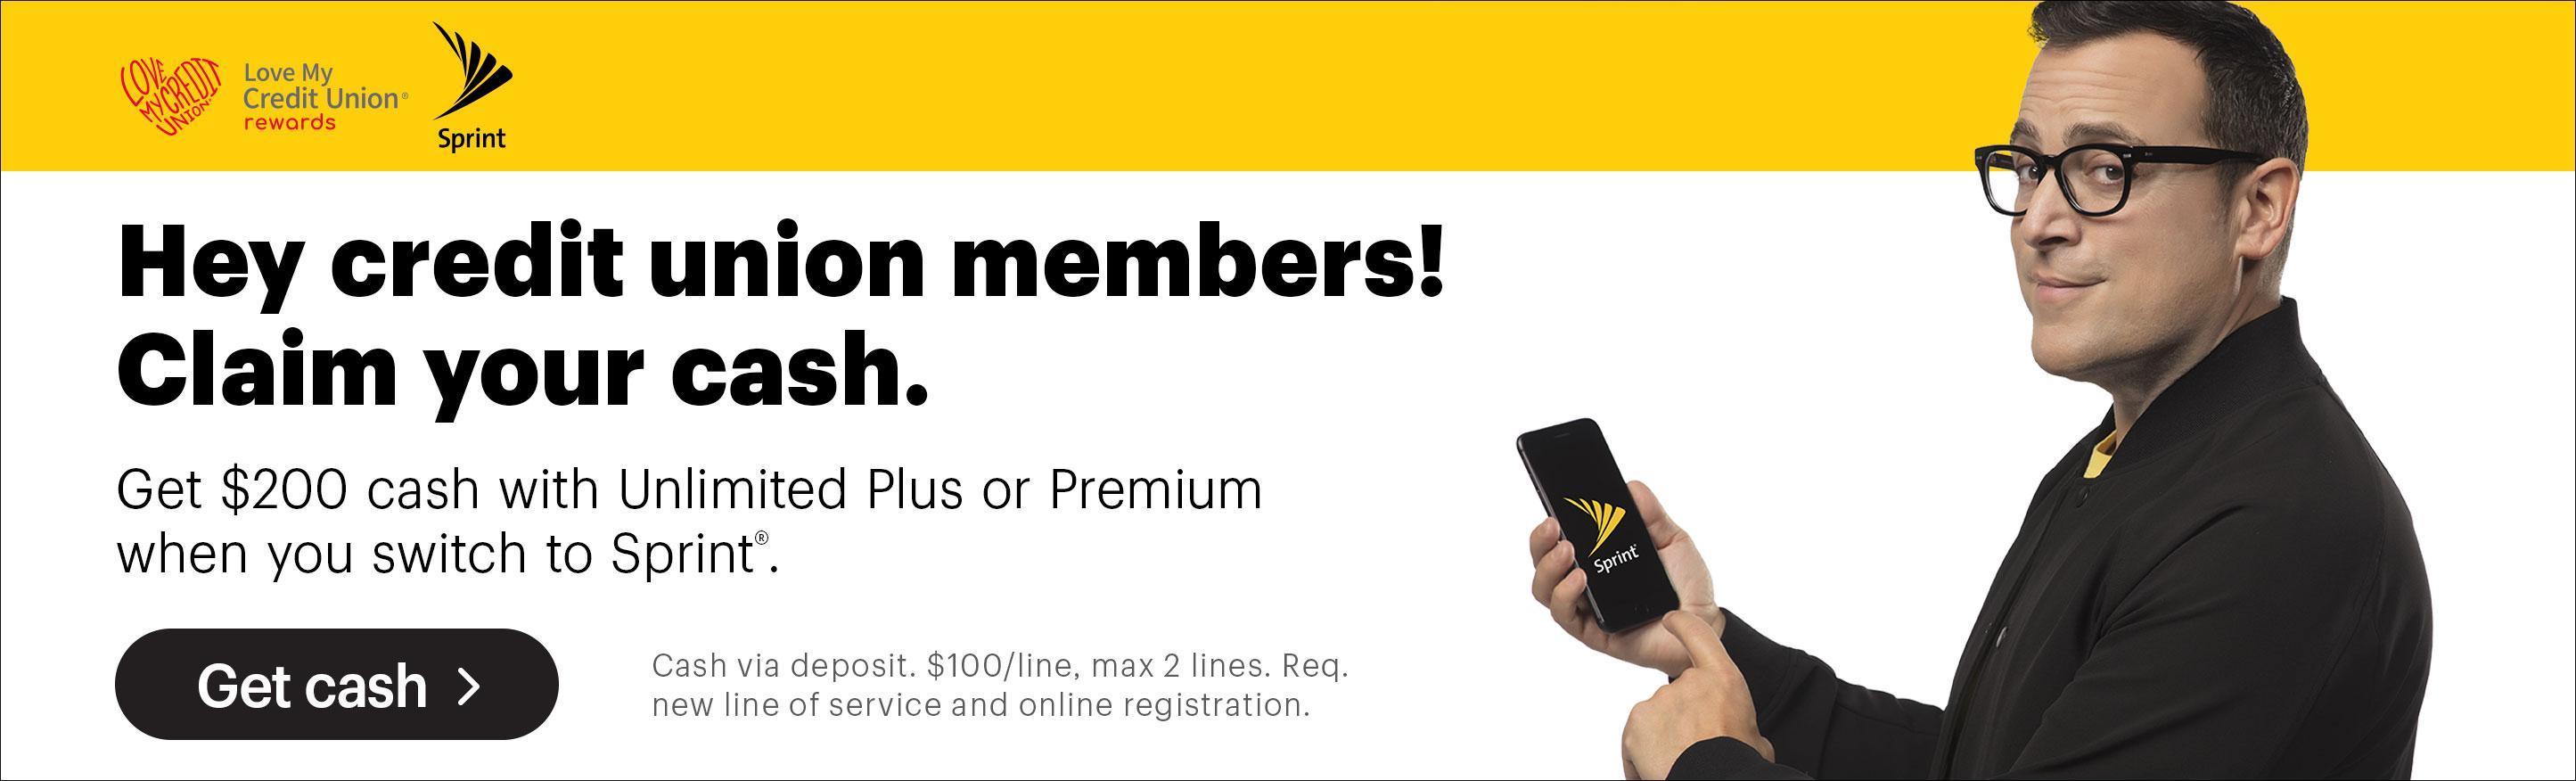 Sprint Credit Union Member Cash Rewards Program